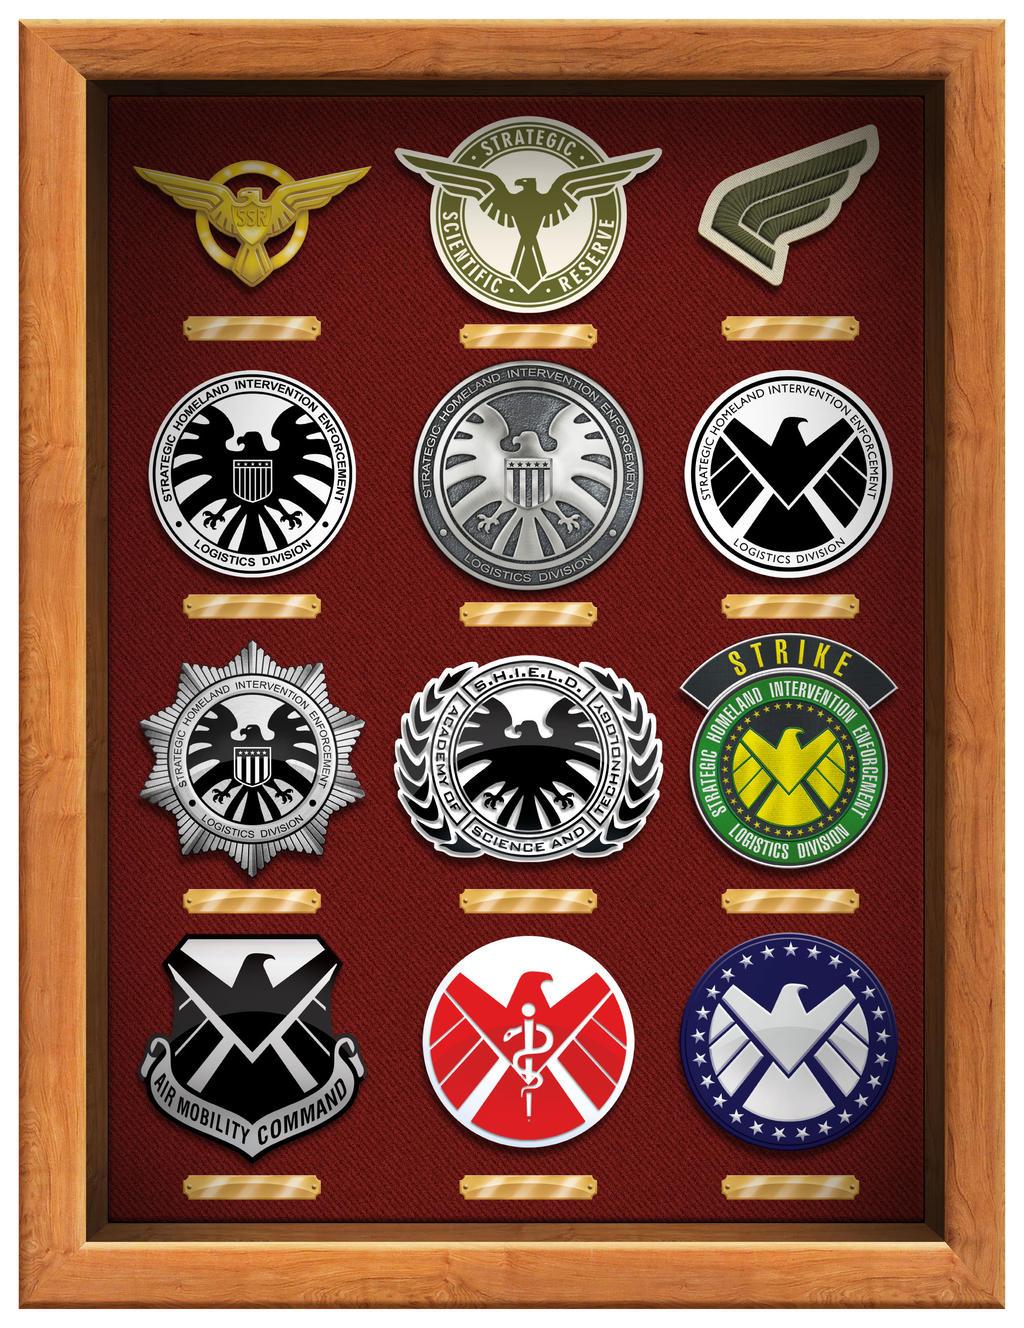 Marvel SHIELD logos by Dom-Graphcom